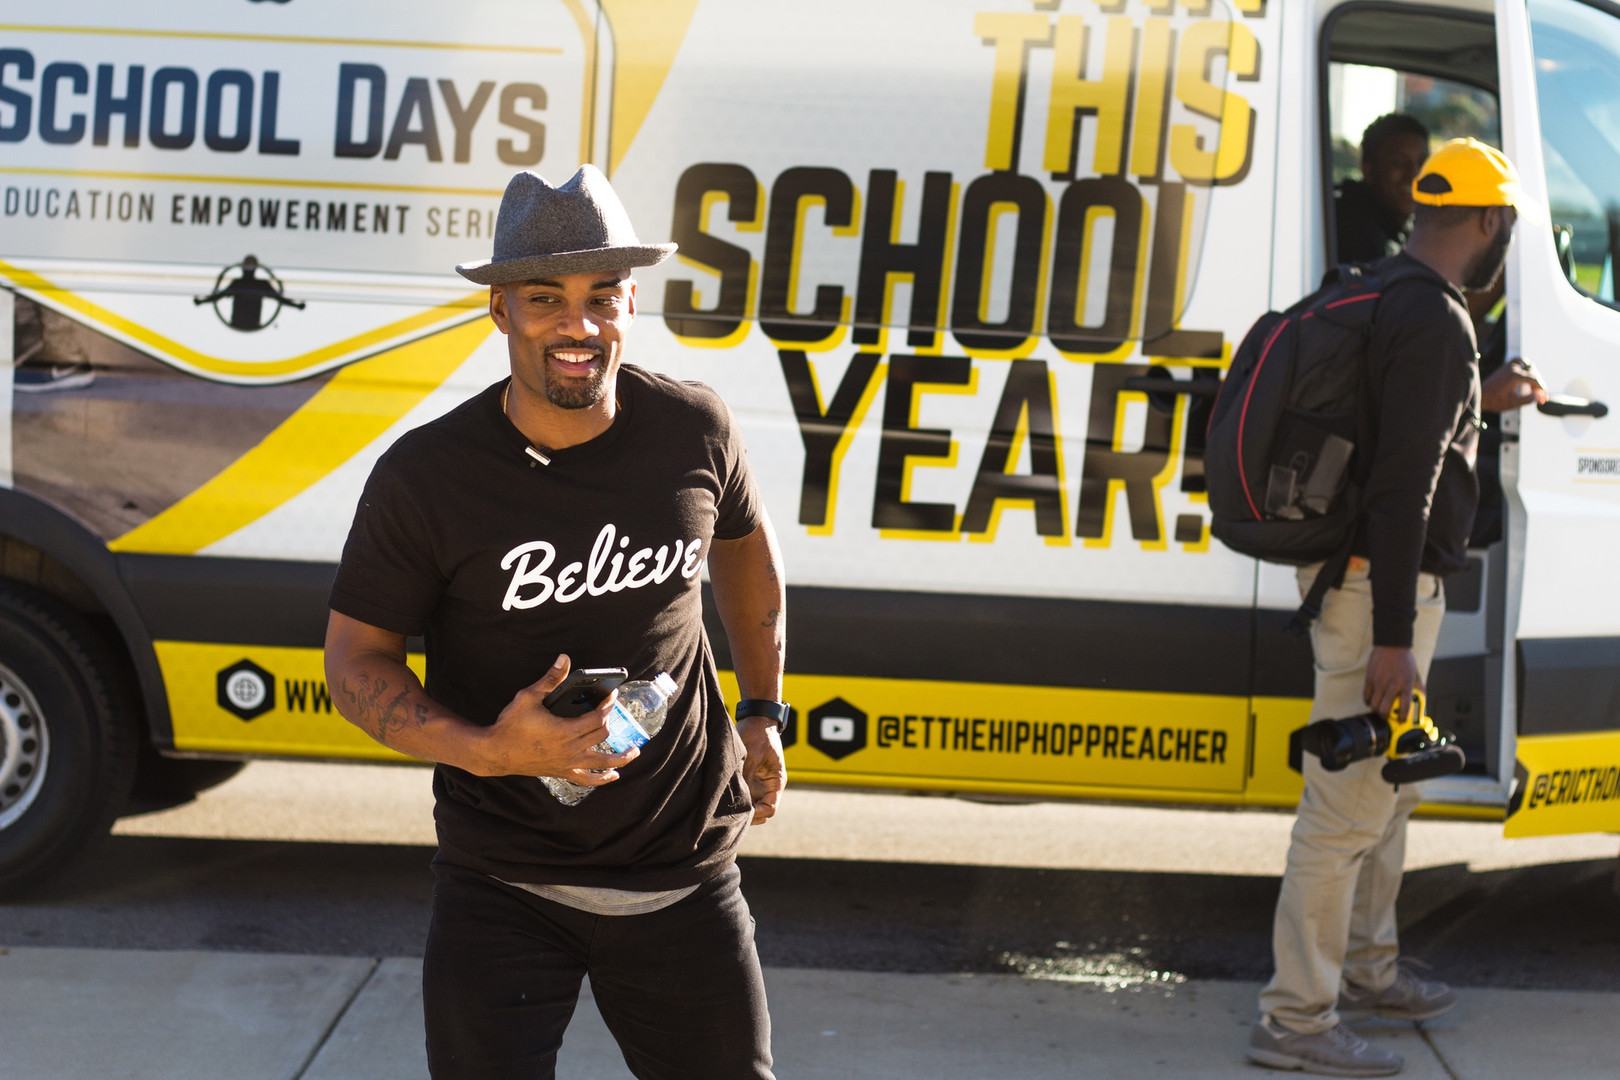 Willie Mo (Outside School Days Tour Bus)